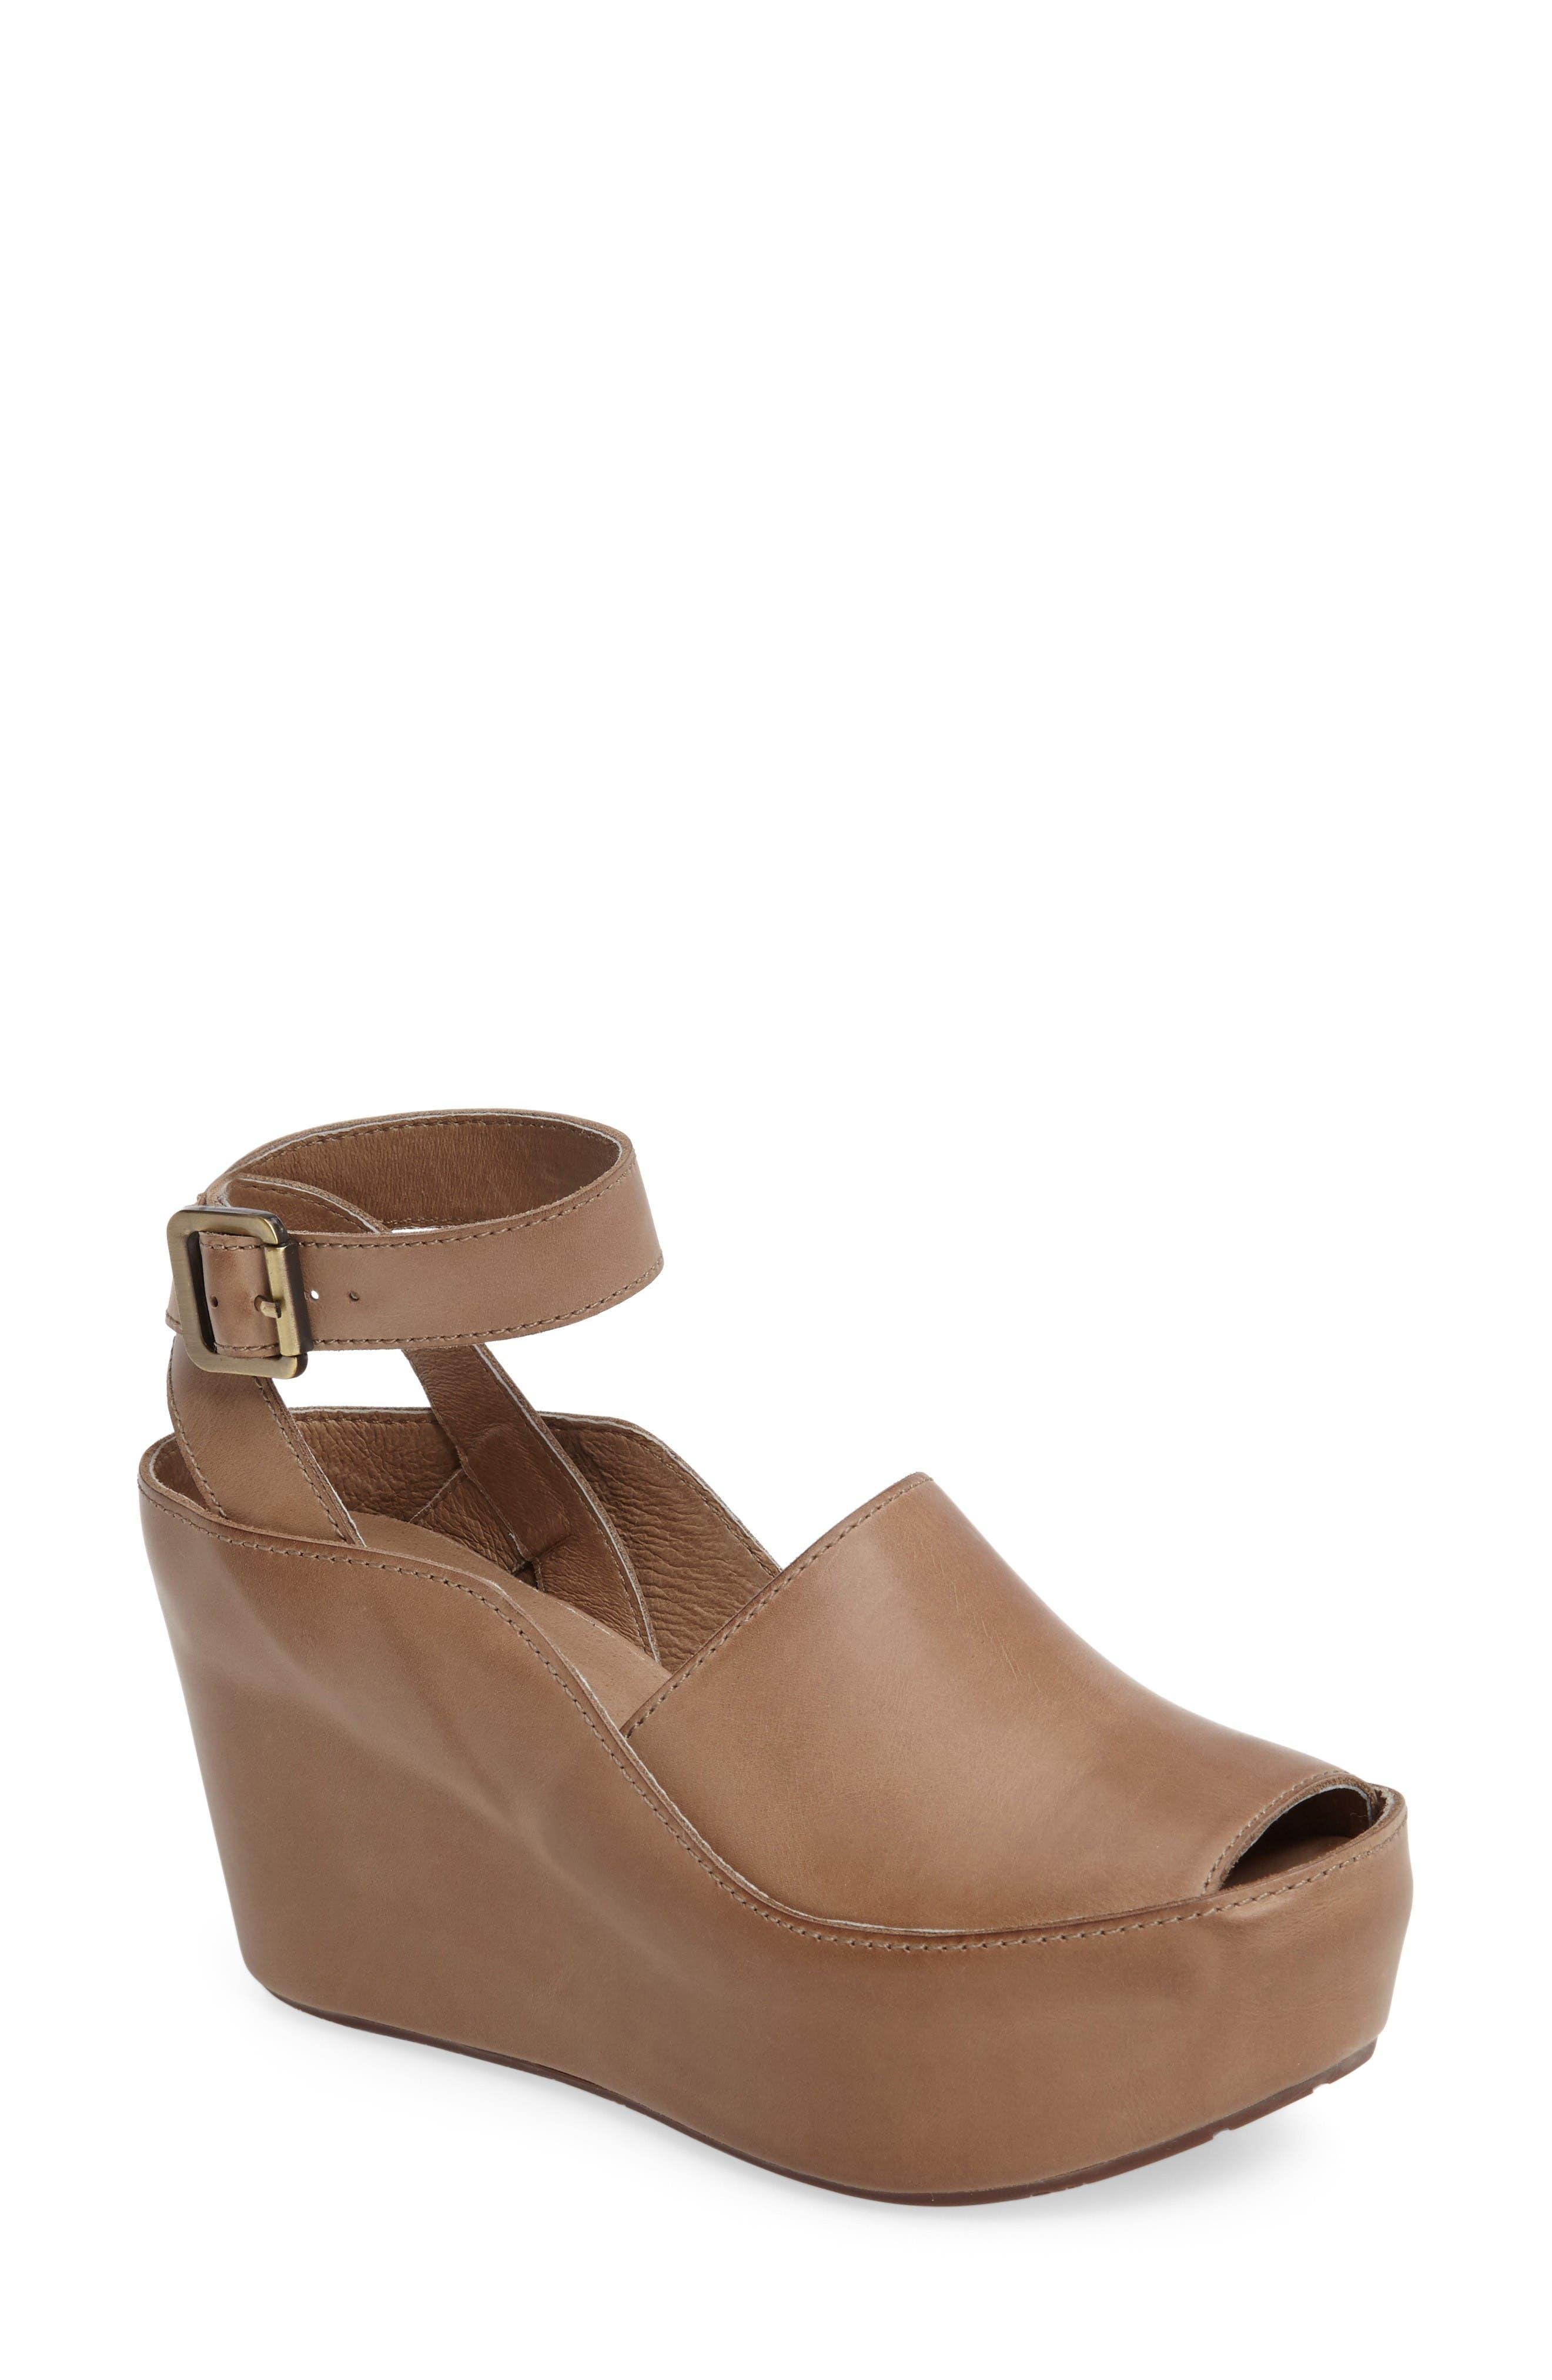 Main Image - Chocolat Blu Wisper Wedge Sandal (Women)